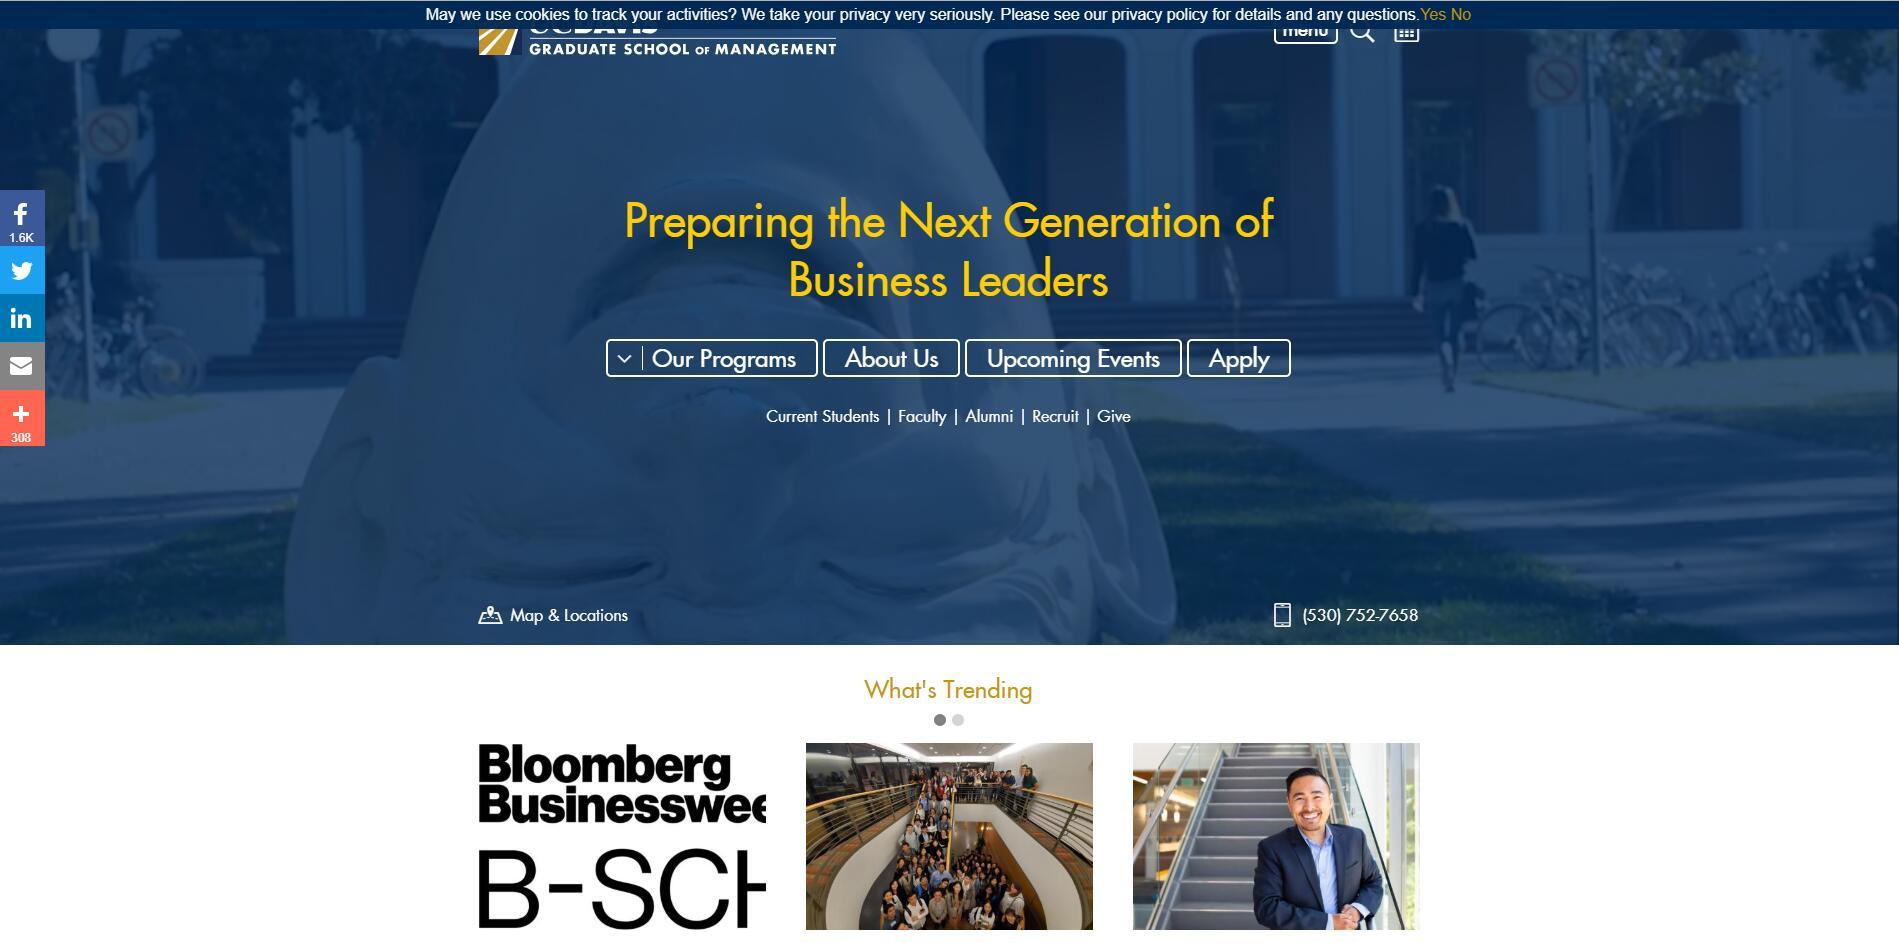 The Graduate School of Management at University of California–Davis